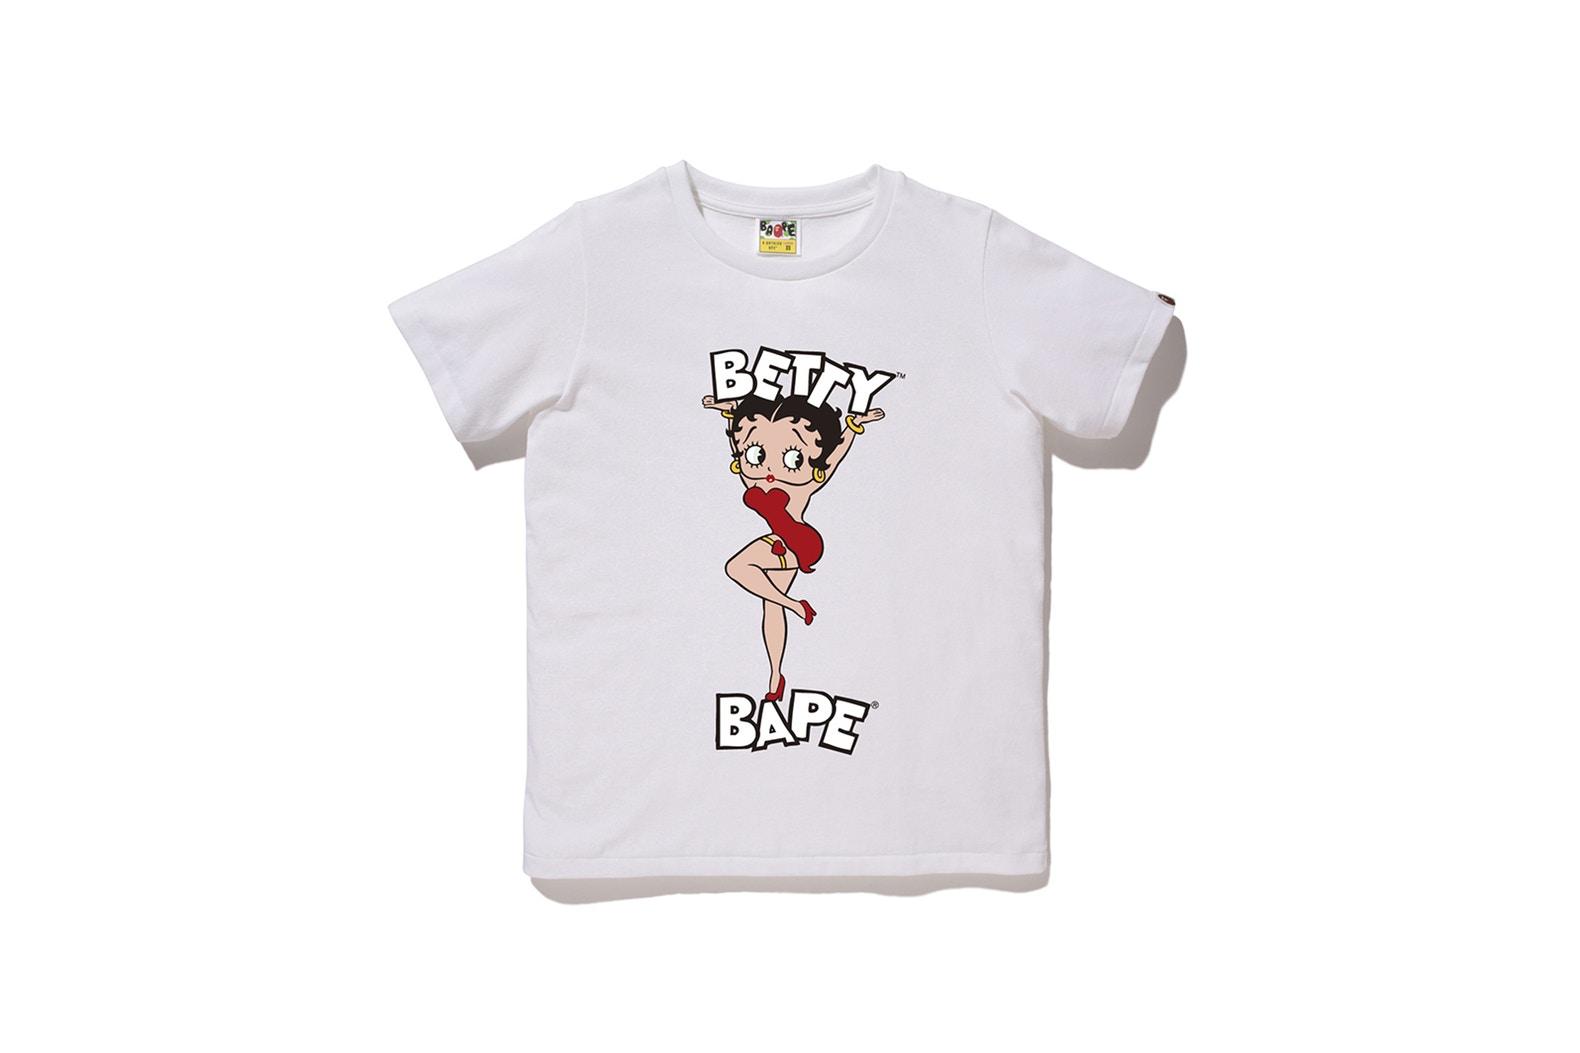 http-bae-hypebeast-comfiles201710betty-boop-bape-collection-z